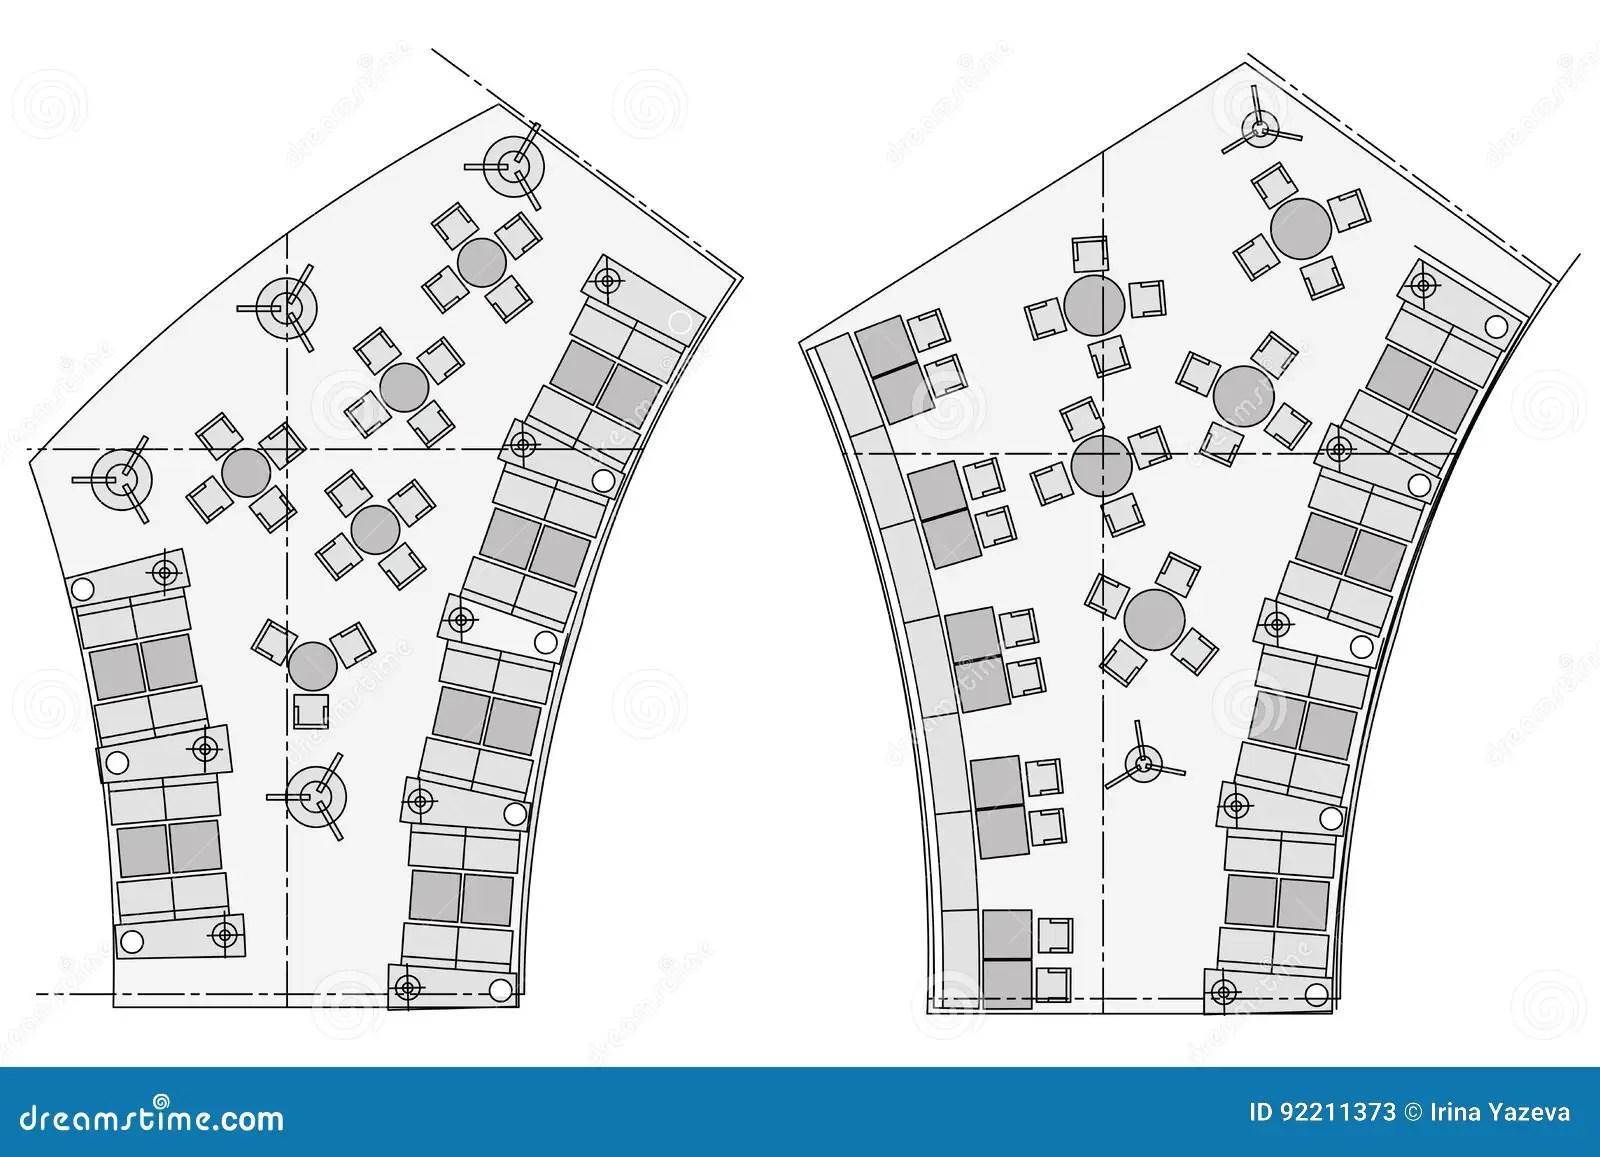 Standard Furniture Symbols Used In Architecture Cartoon